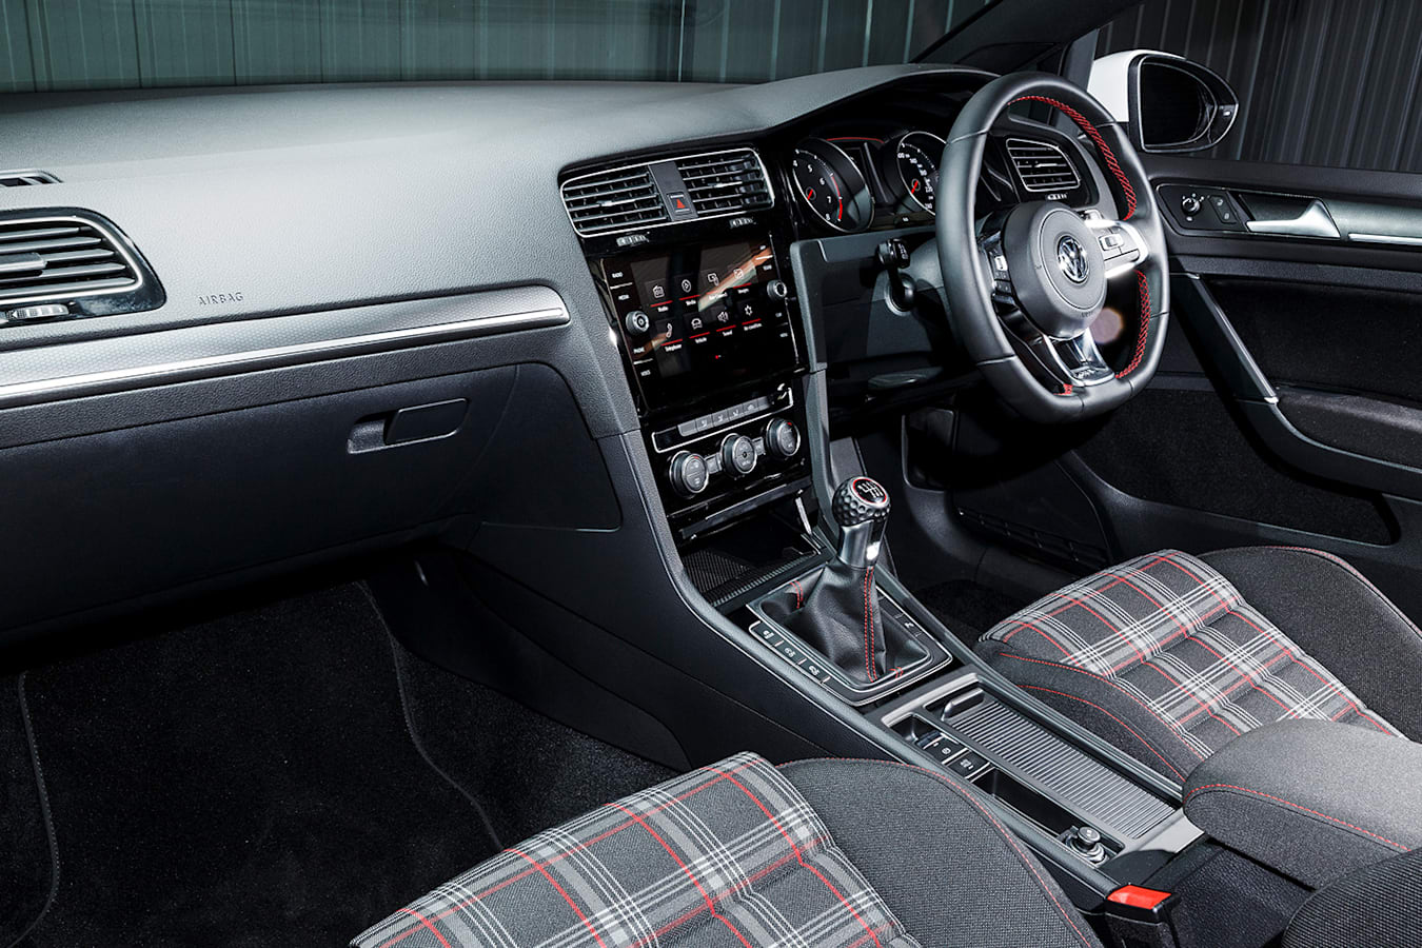 Volkswagen Golf Gti Original Interior Jpg